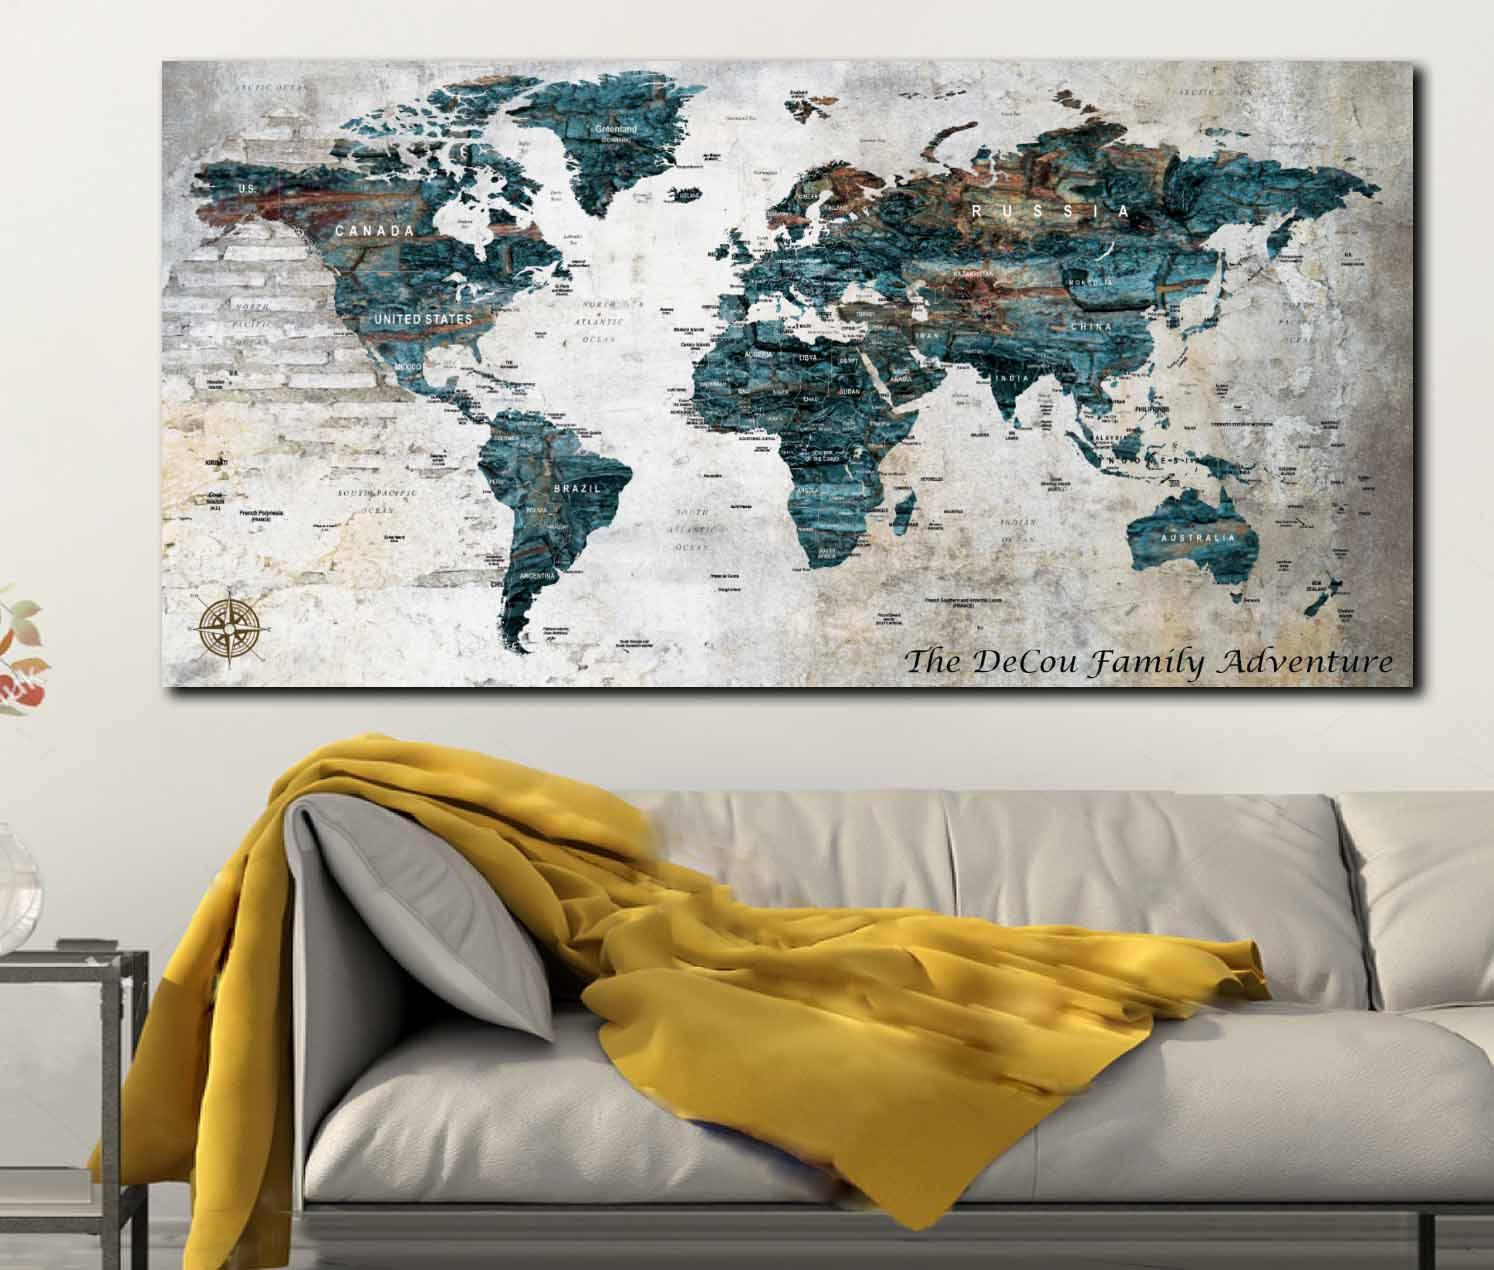 World maptravel map posterpush pin world mapcustom world ampliar gumiabroncs Image collections